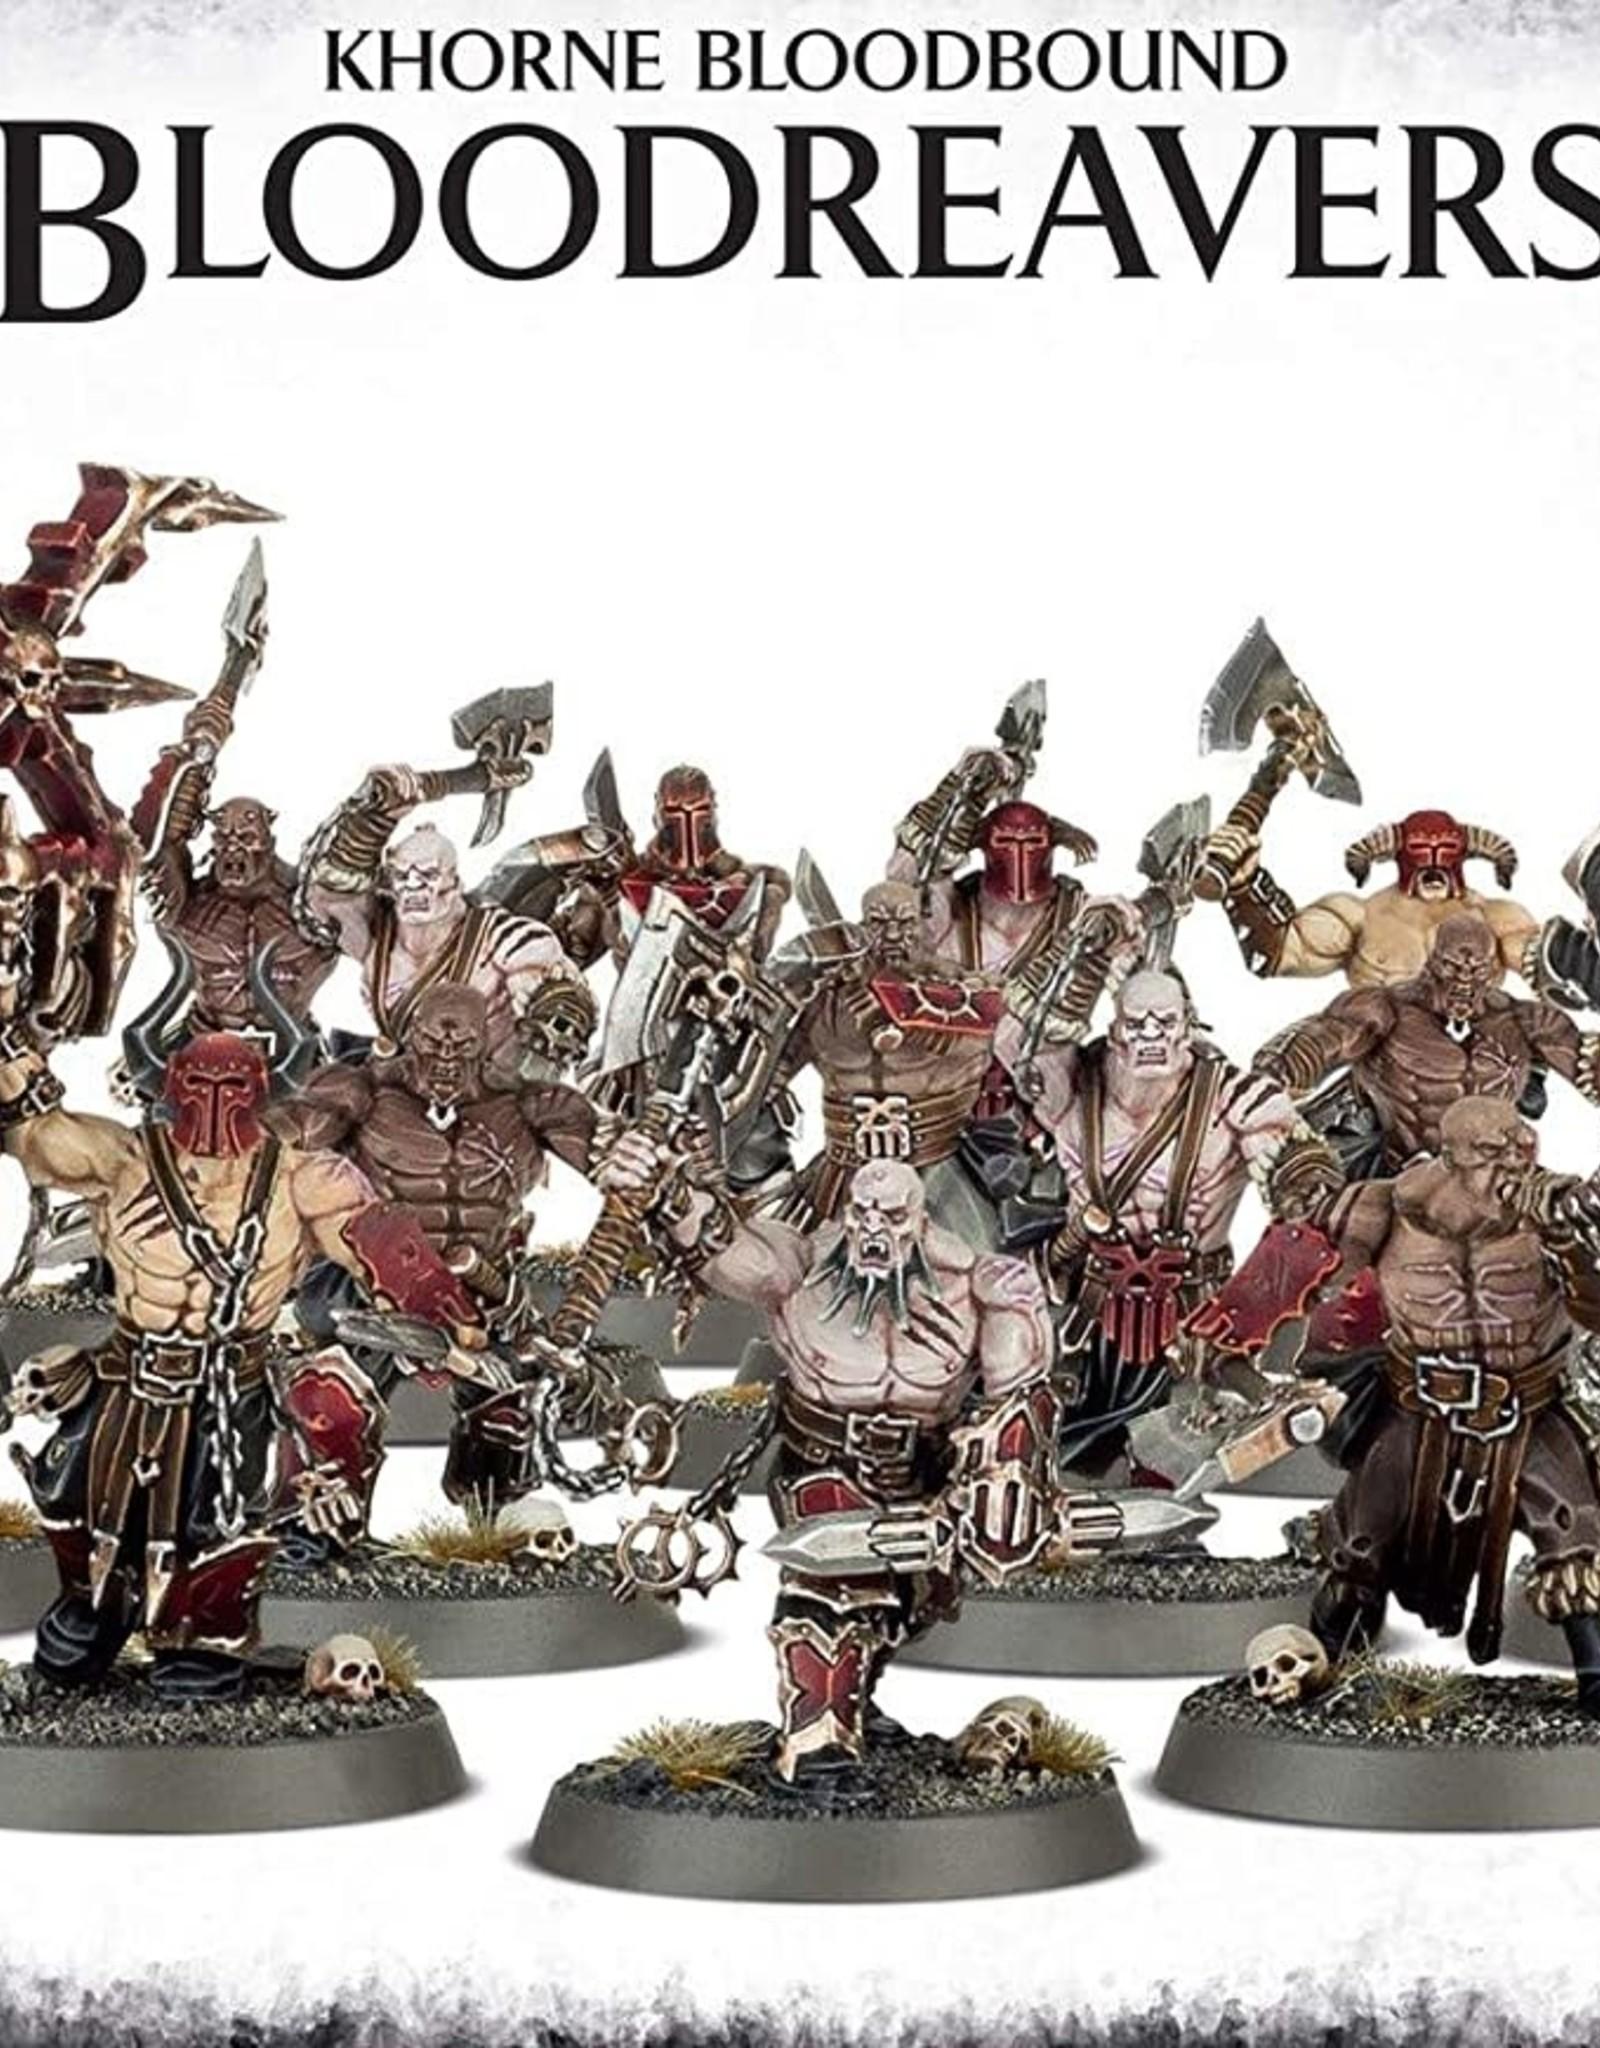 Games Workshop AoS Bloodreavers